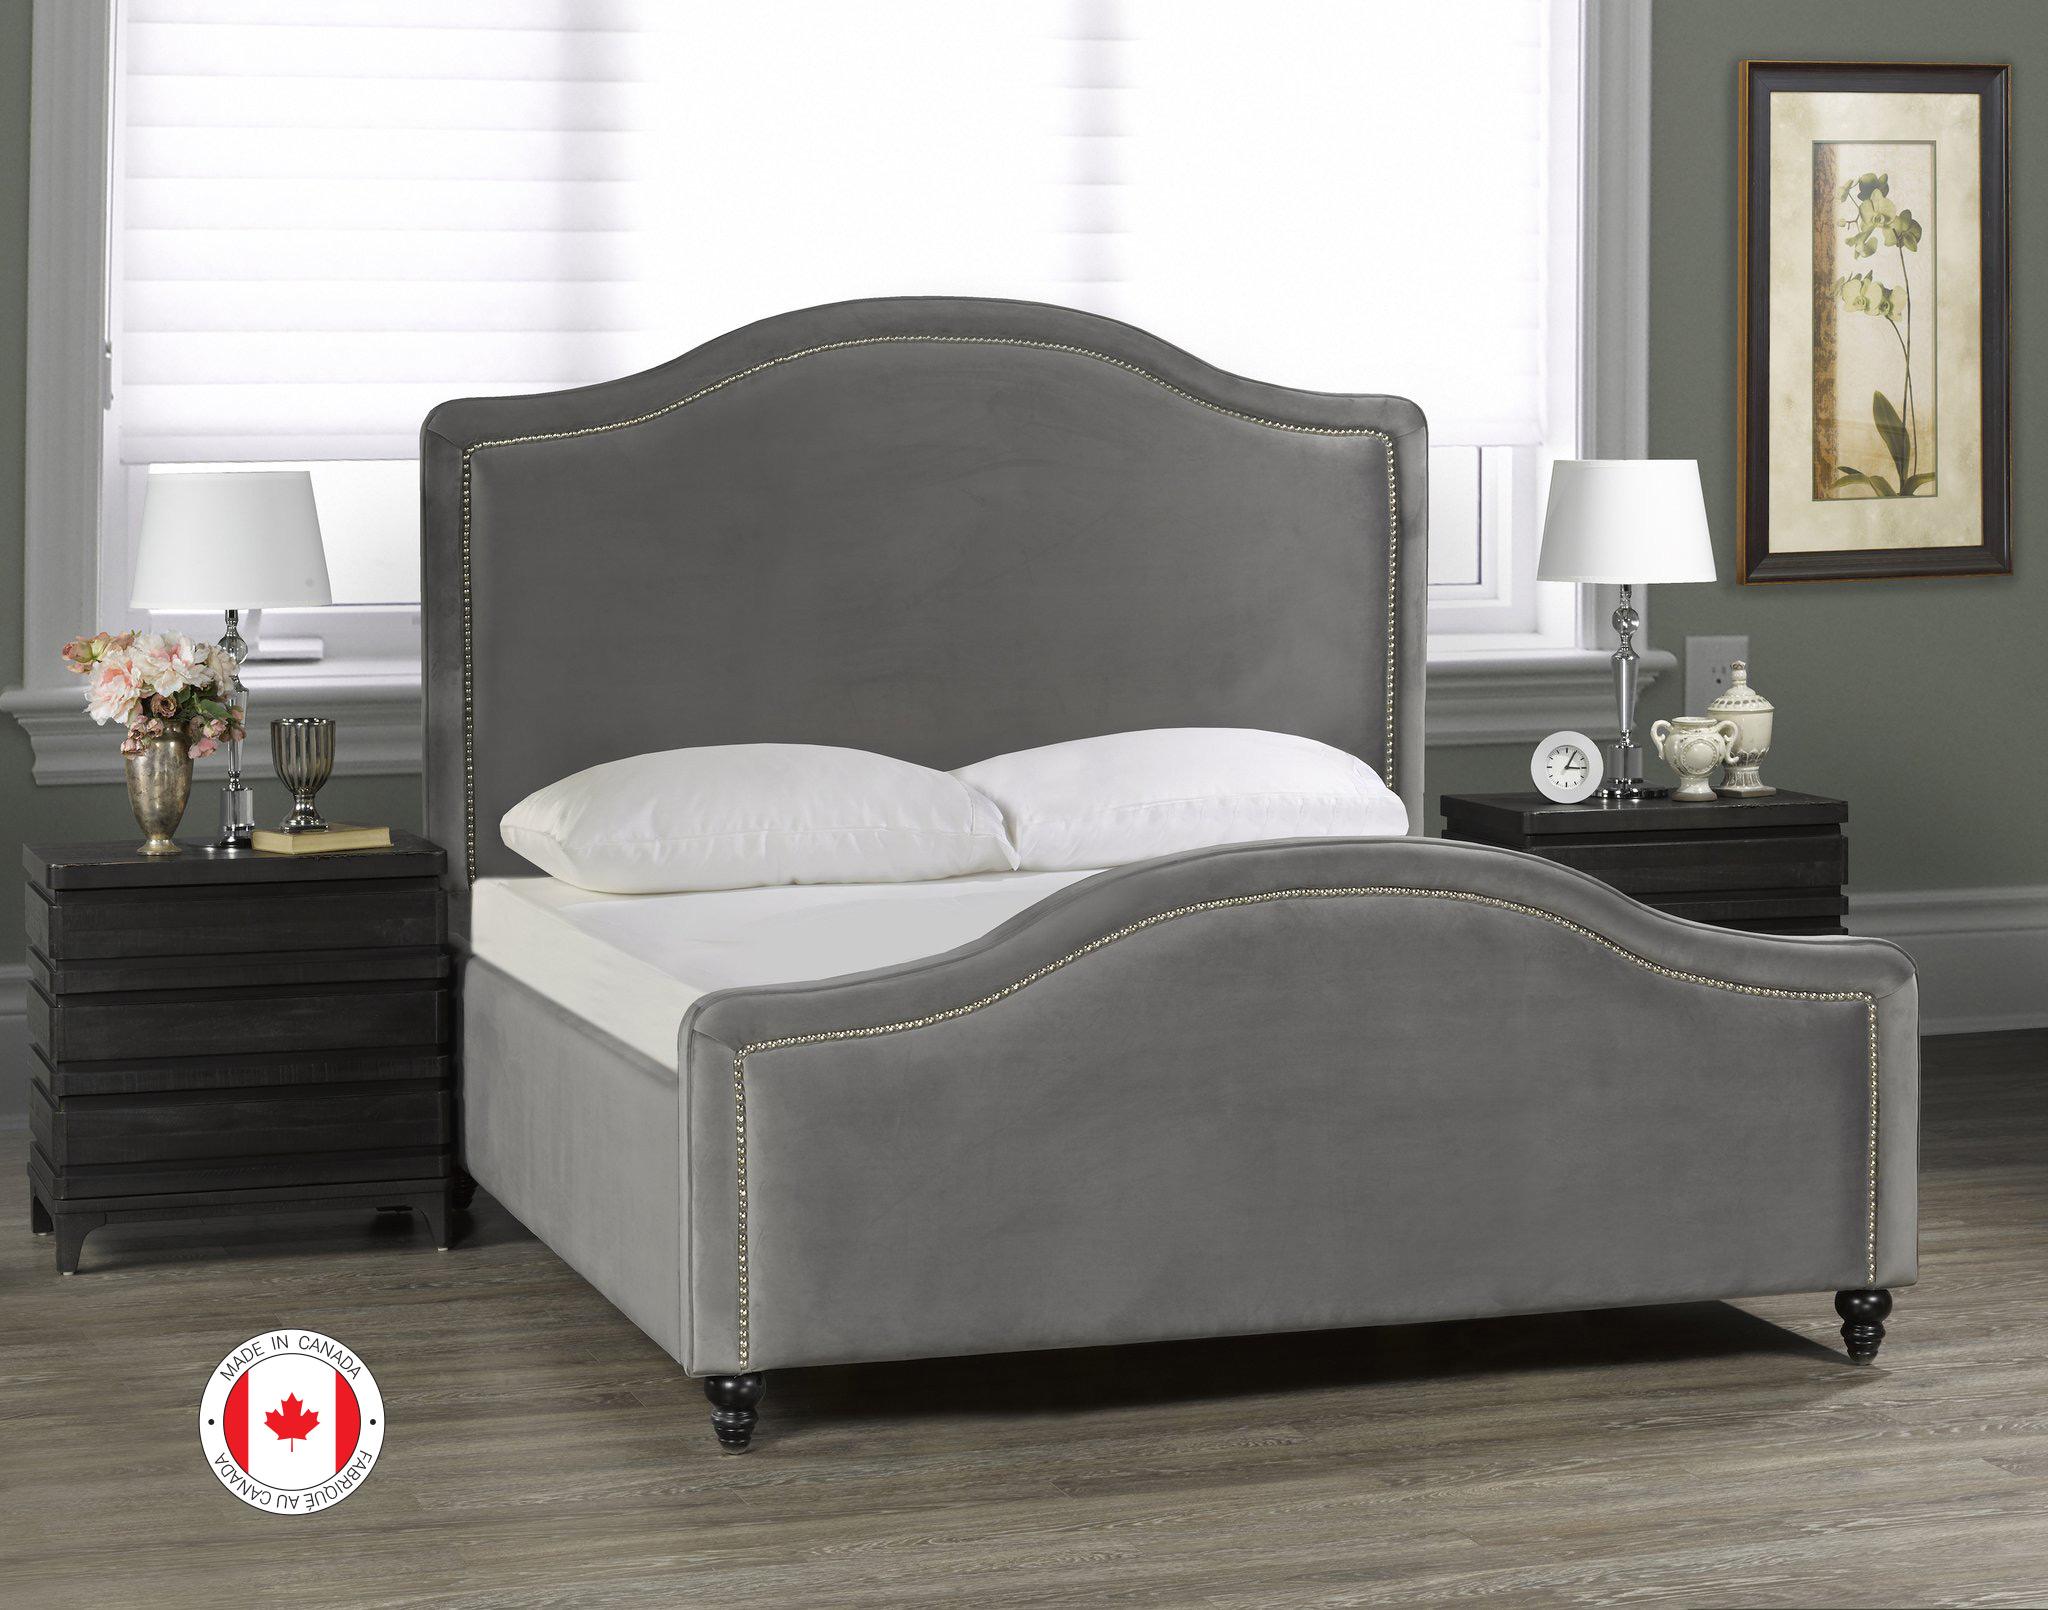 KINGSTON FULL SIZE PLATFORM BED